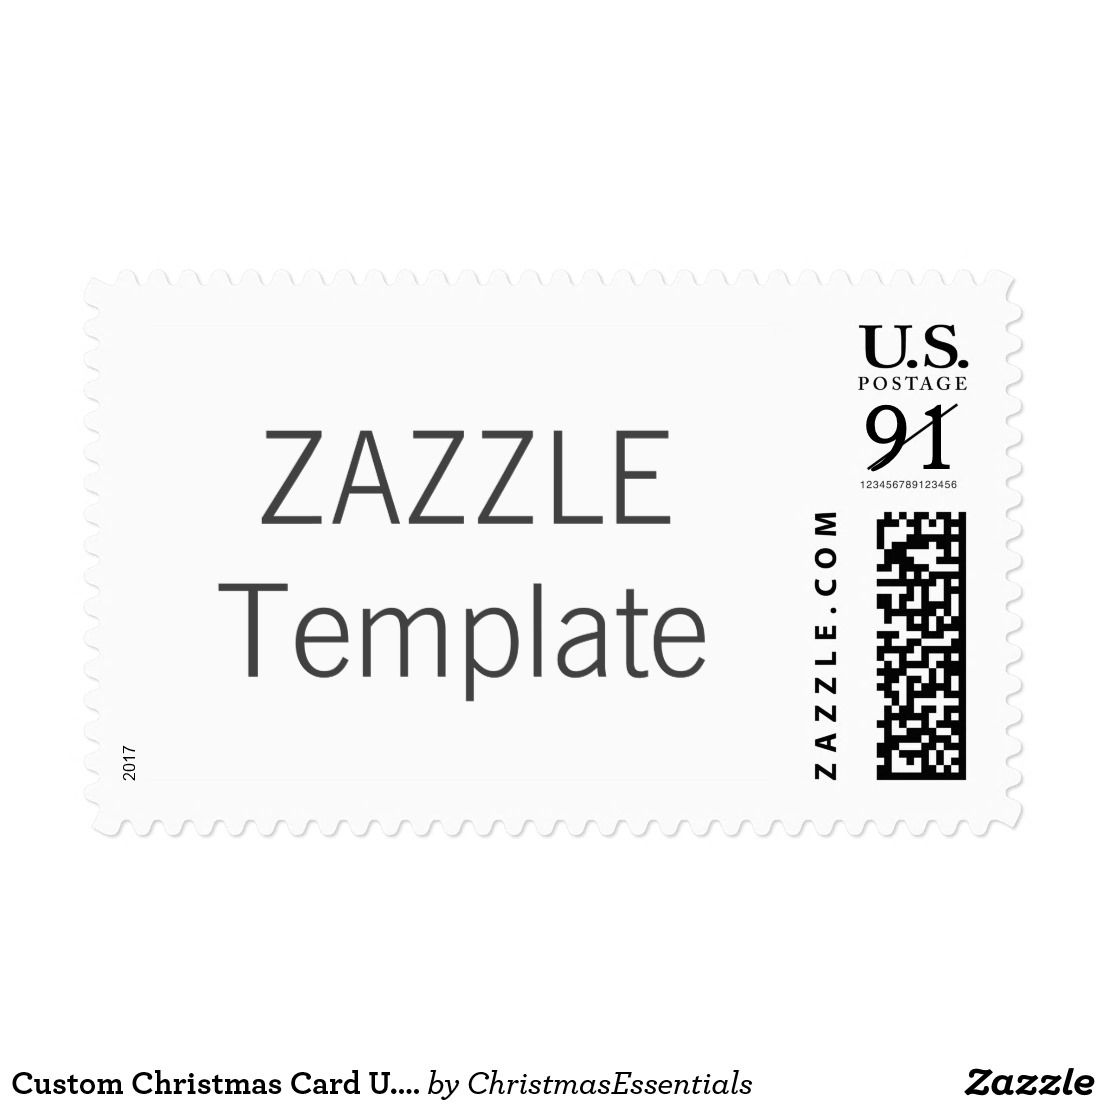 Christmas Card U.S. Postage Stamp LARGE